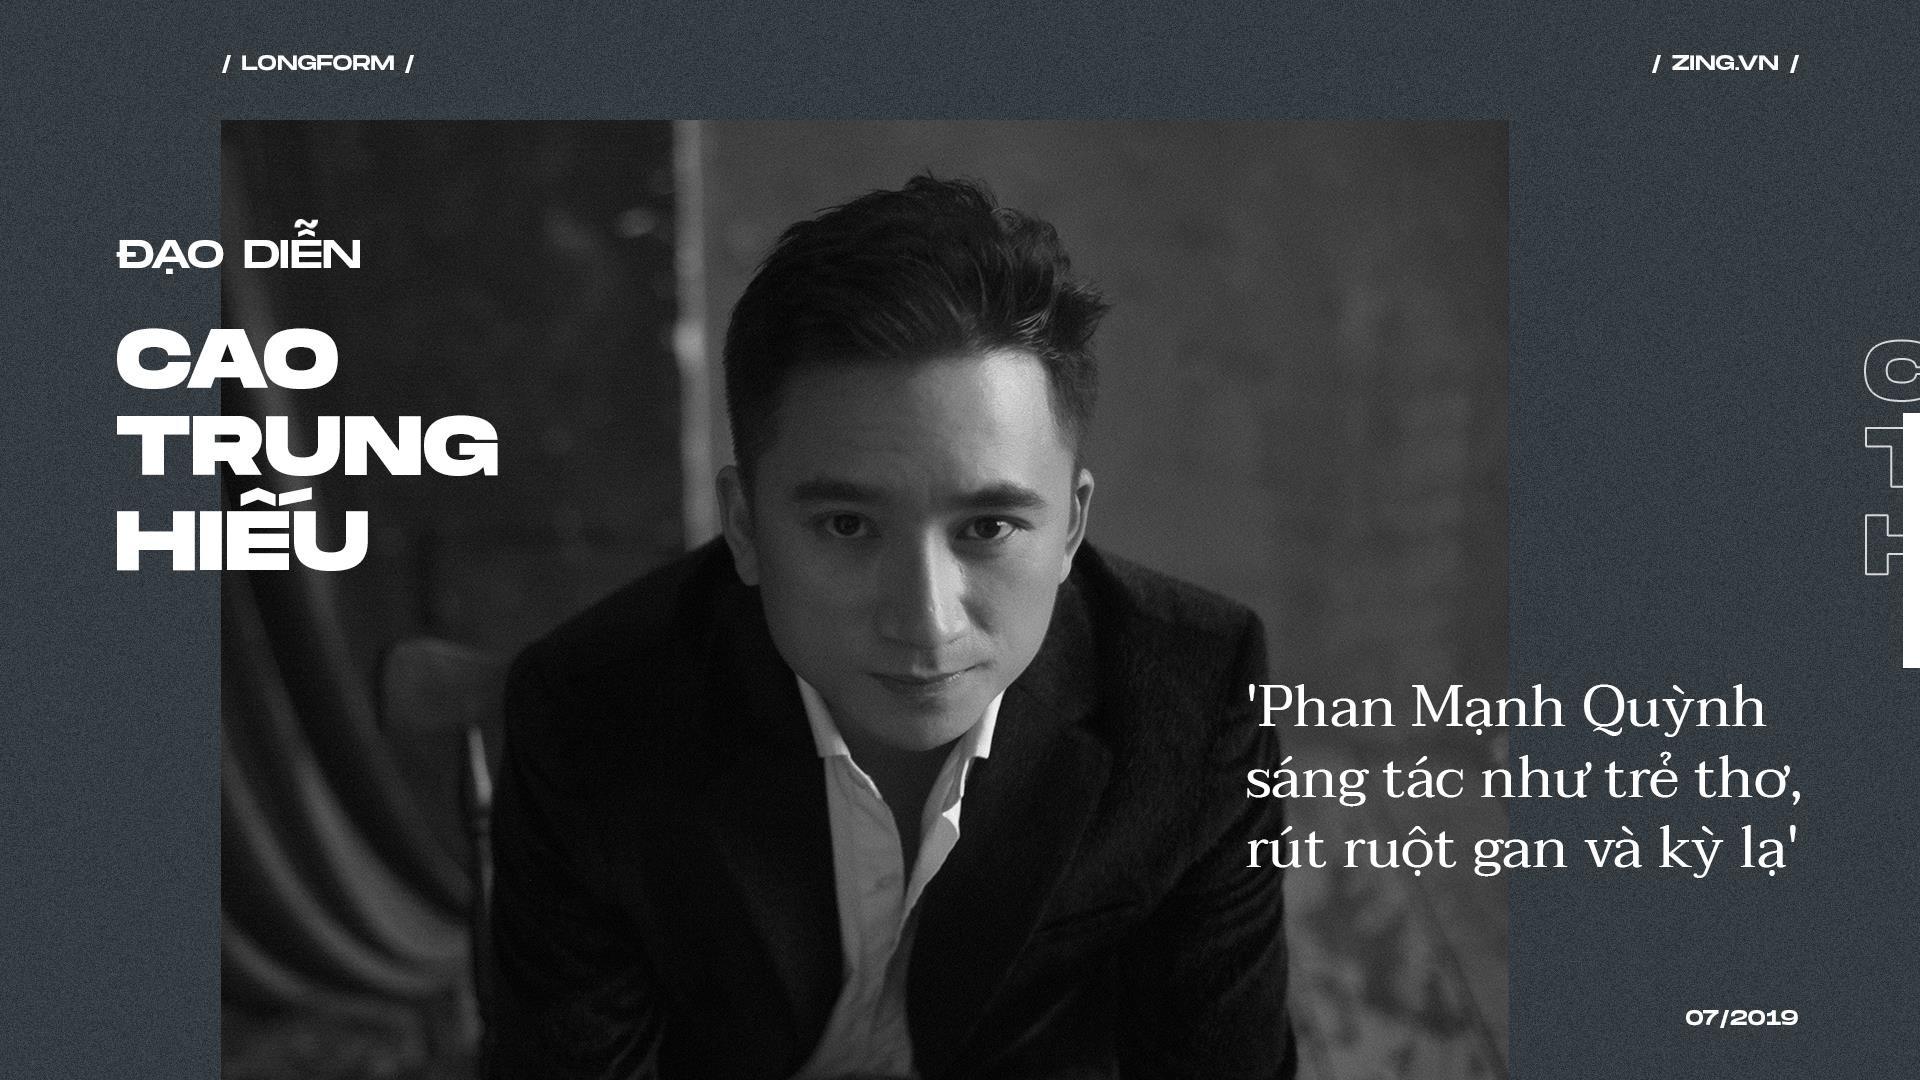 'Phan Manh Quynh sang tac nhu tre tho, rut ruot gan va ky la' hinh anh 2